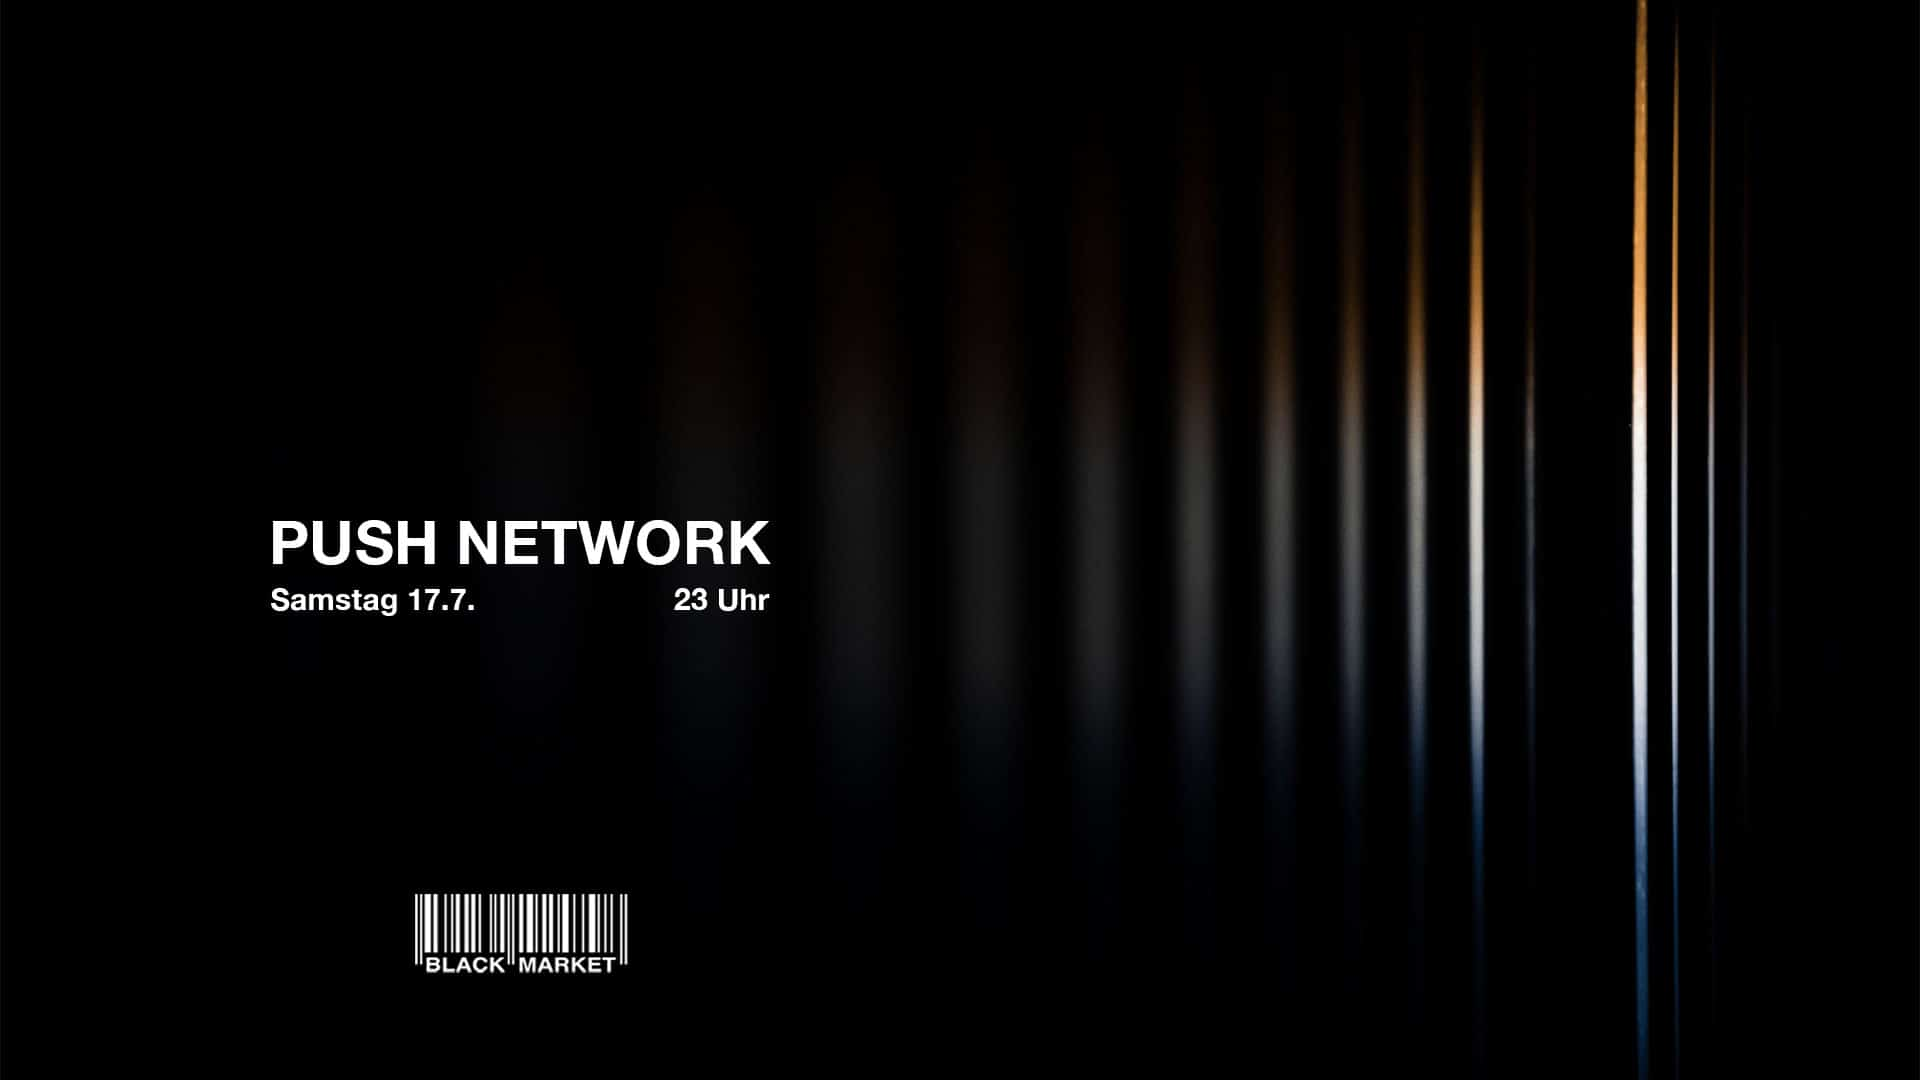 Events Wien: BM invites PUSH NETWORK